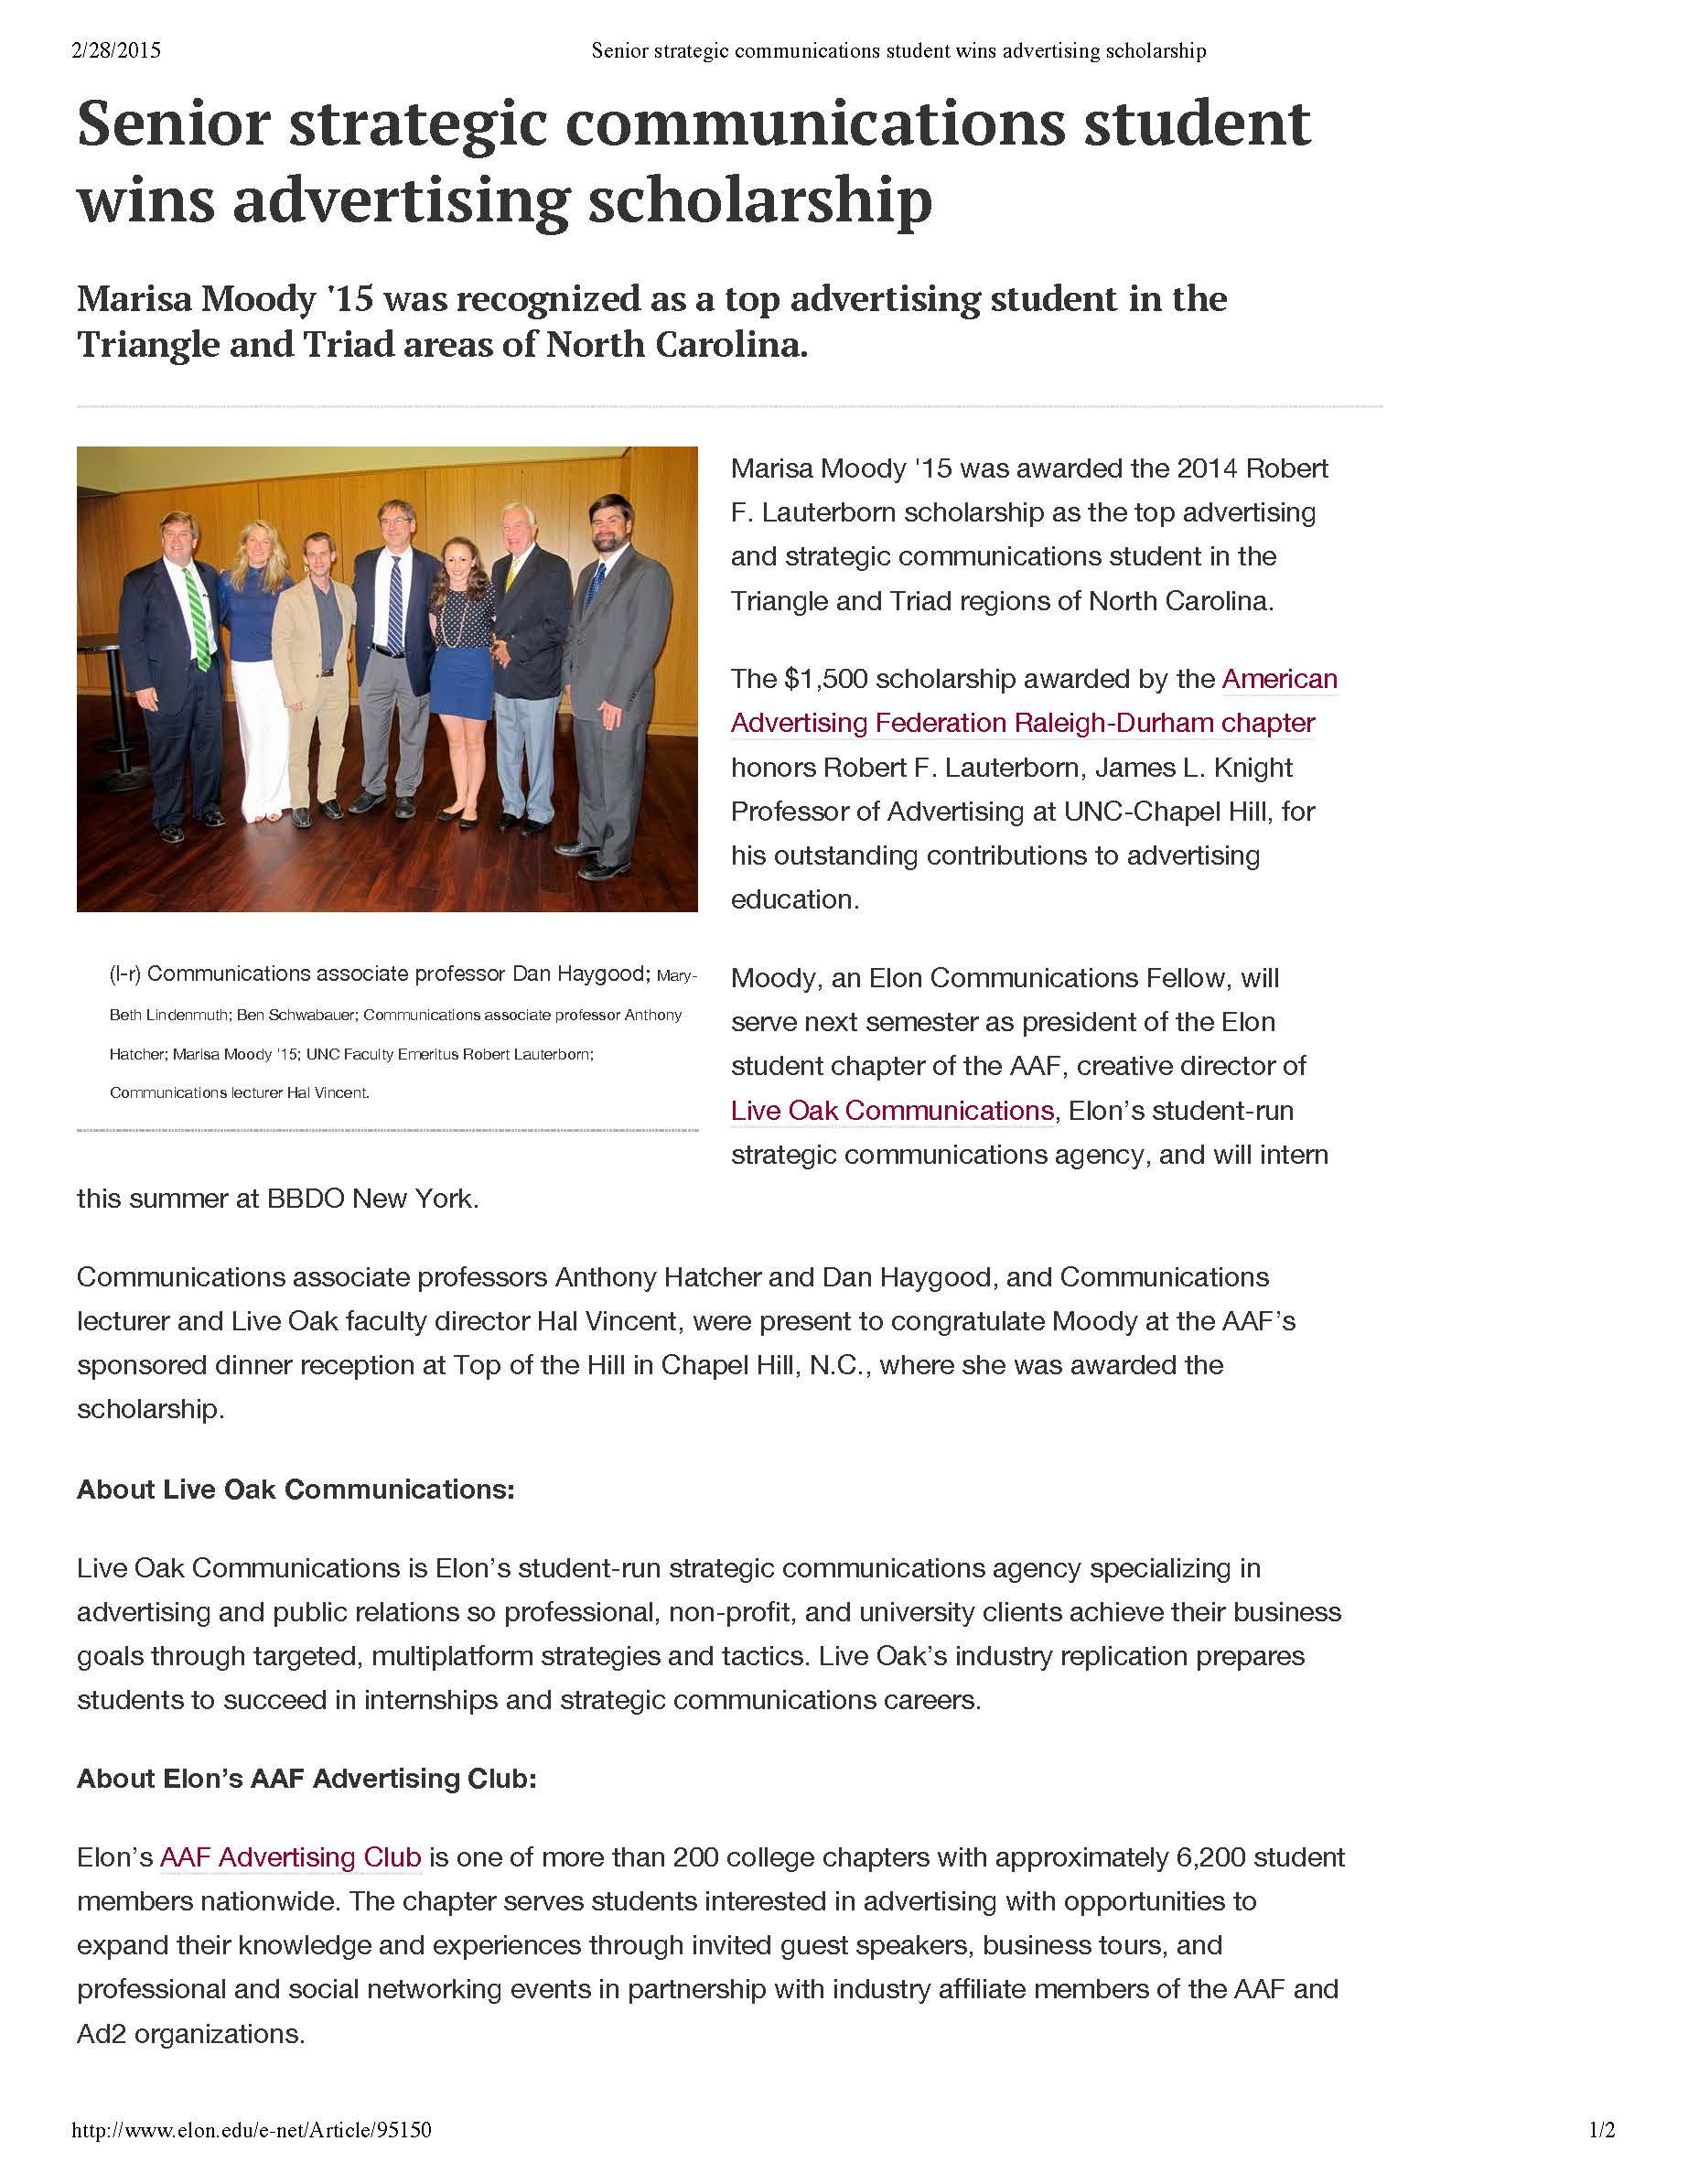 Senior strategic communications student wins advertising scholarship_Page_1.jpg